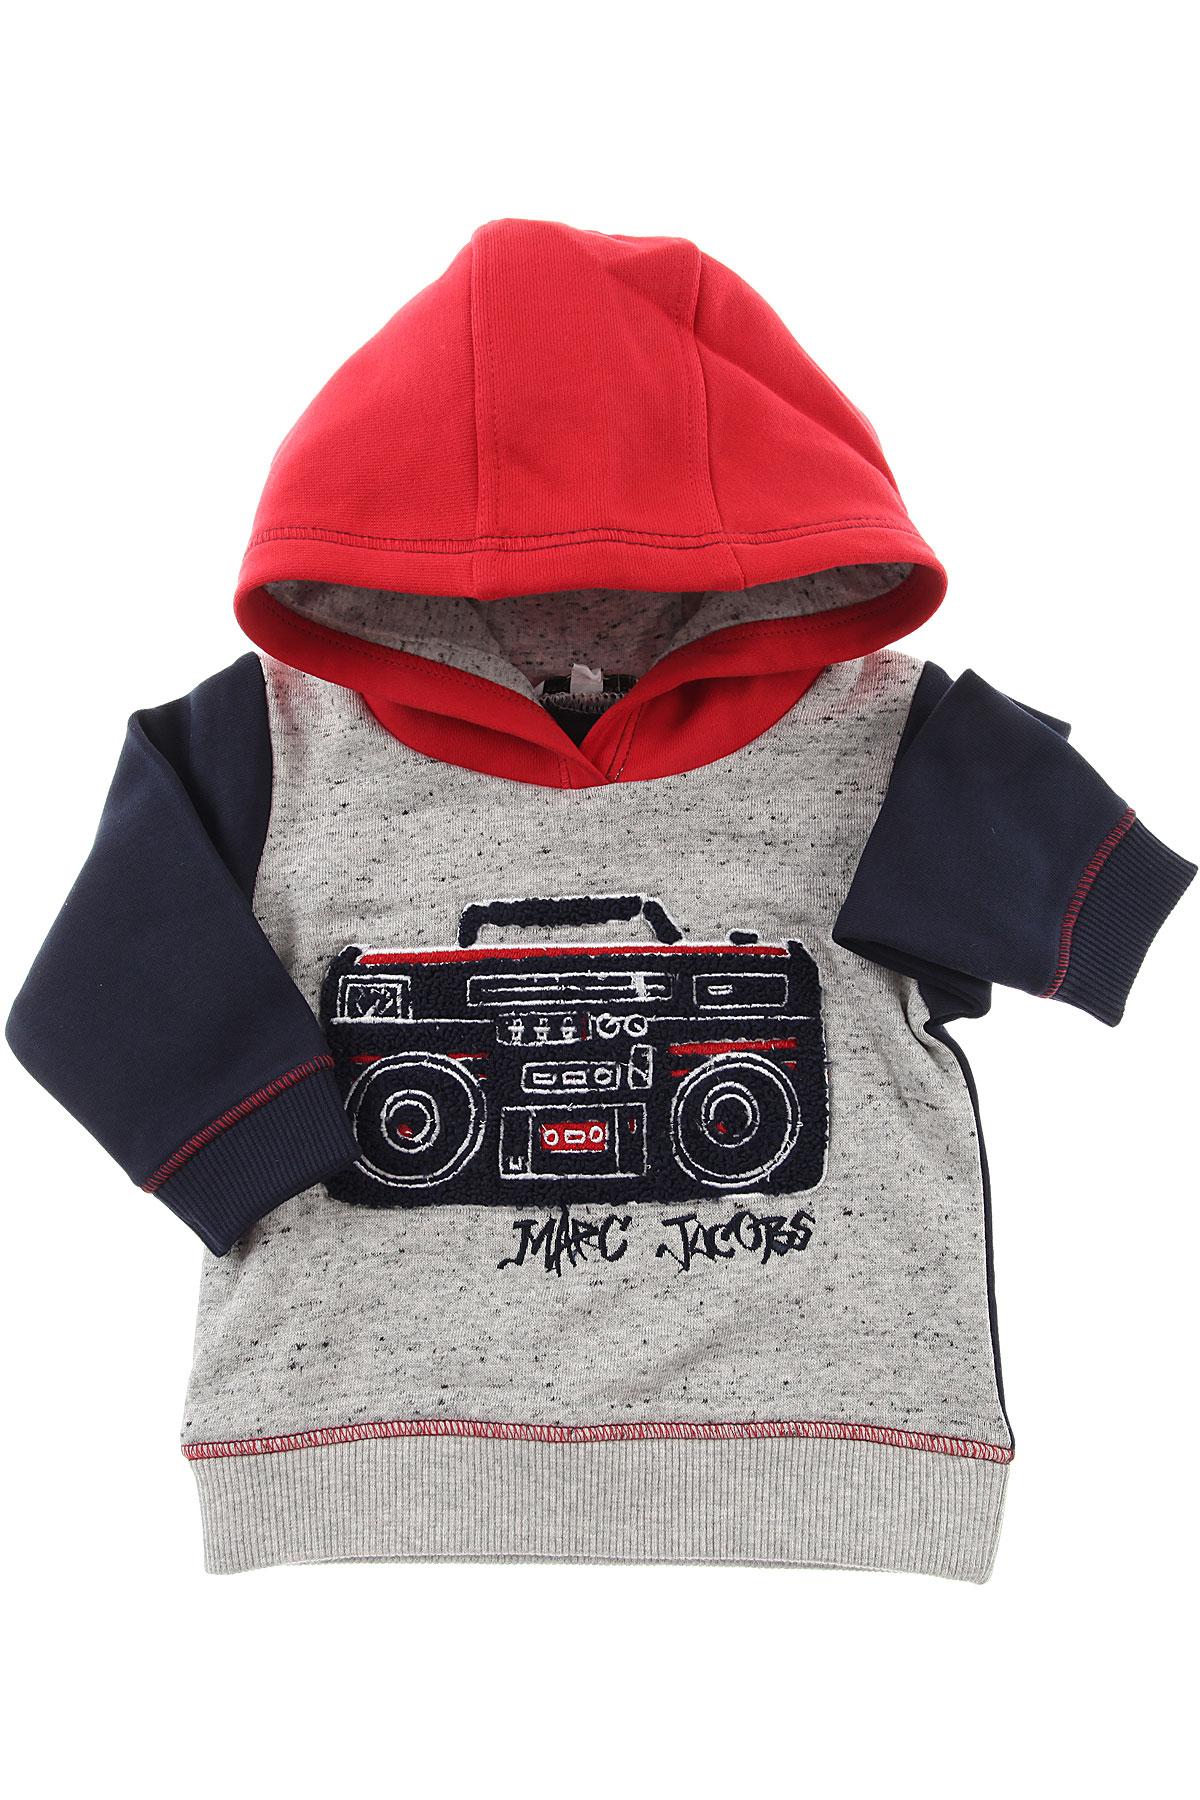 Image of Marc Jacobs Baby Sweatshirts & Hoodies for Boys, Grey, Cotton, 2017, 12M 2Y 3Y 6M 9M